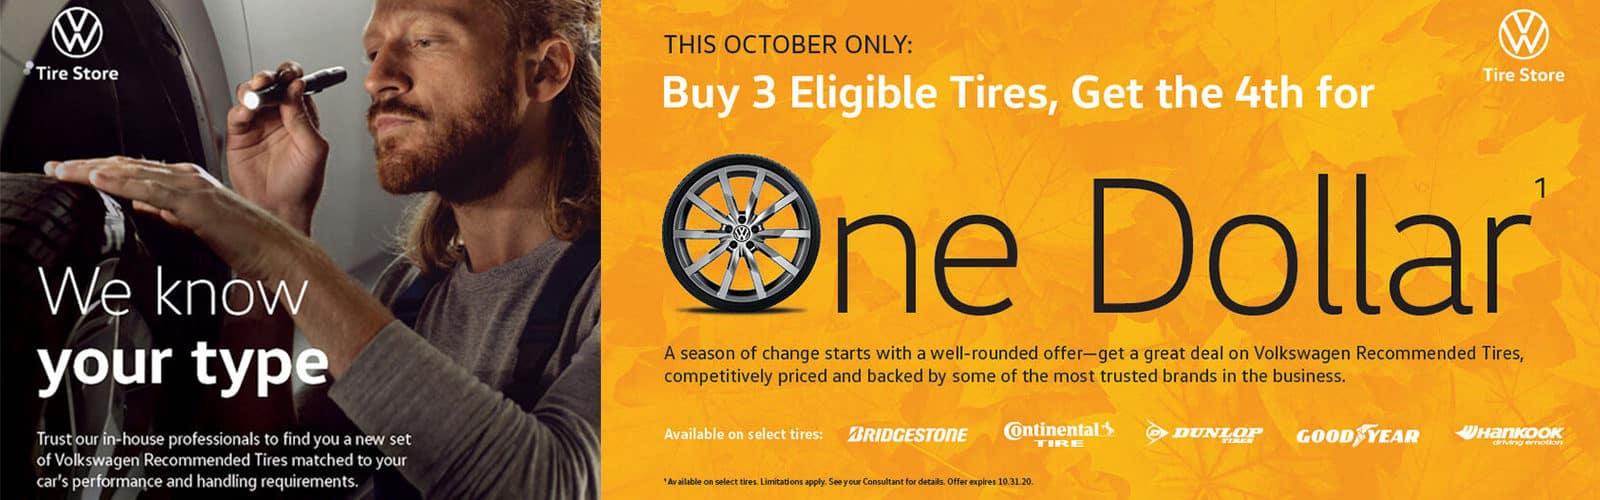 VW Tires October